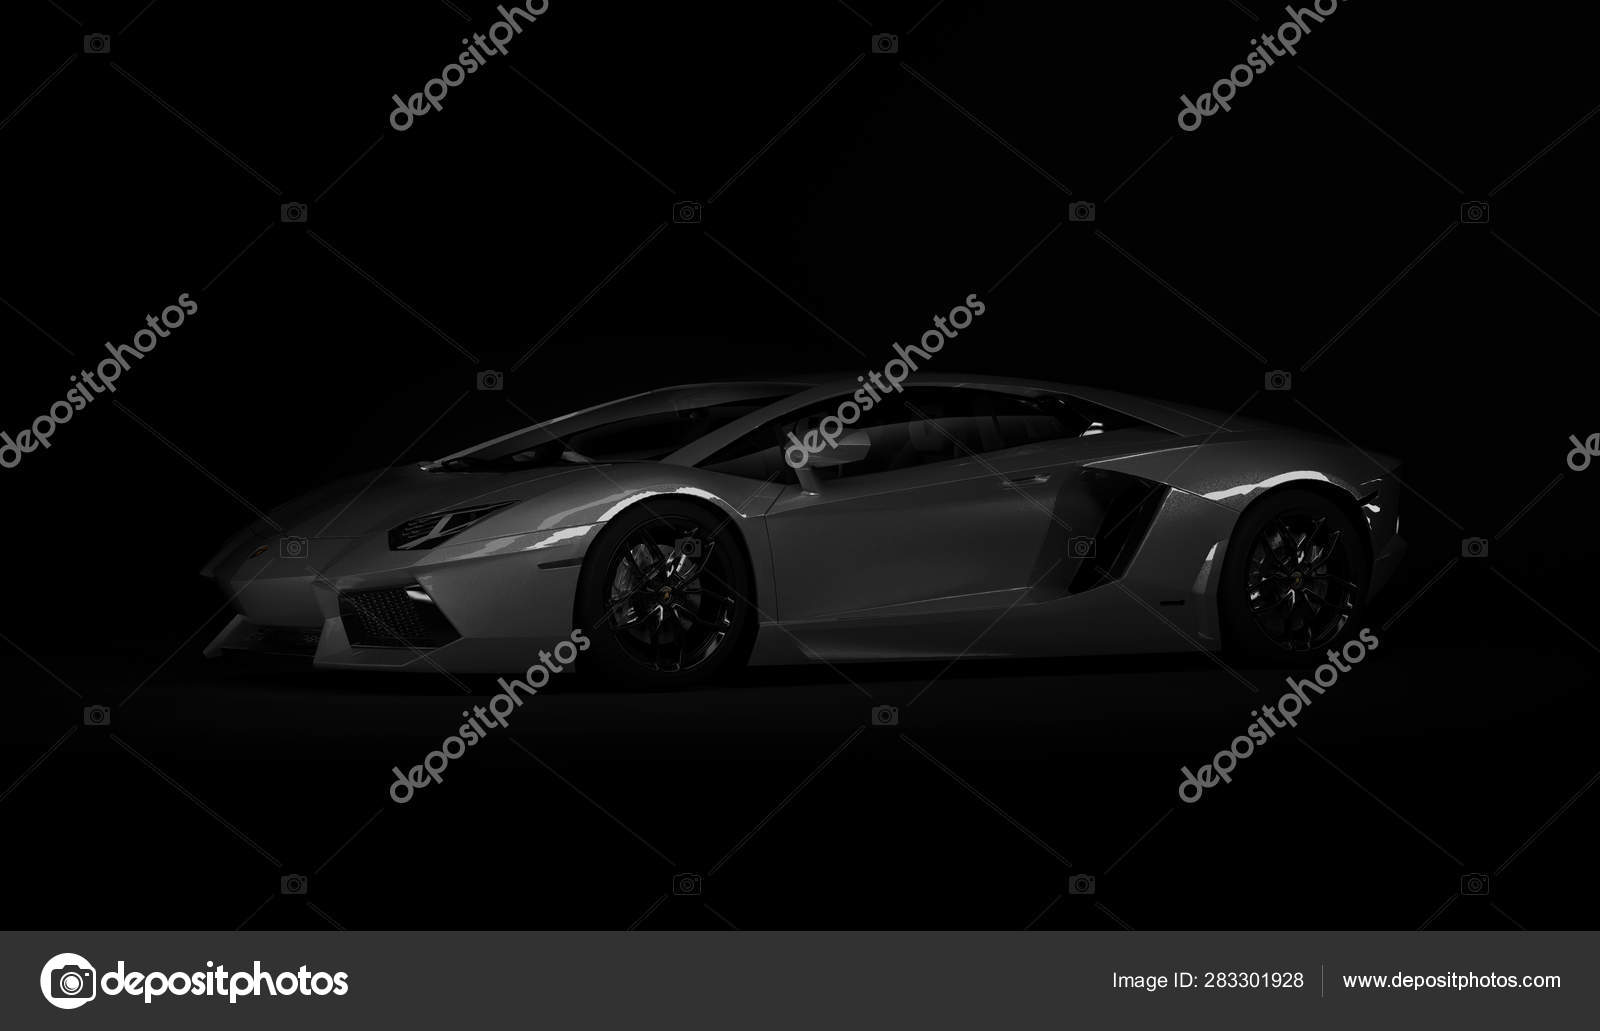 Almaty Kazakhstan Juli 08 Lamborghini Aventador Luxury Stylish Sport Car On Dark Black Background 3d Render Stock Editorial Photo C Medvedsky Kz 283301928